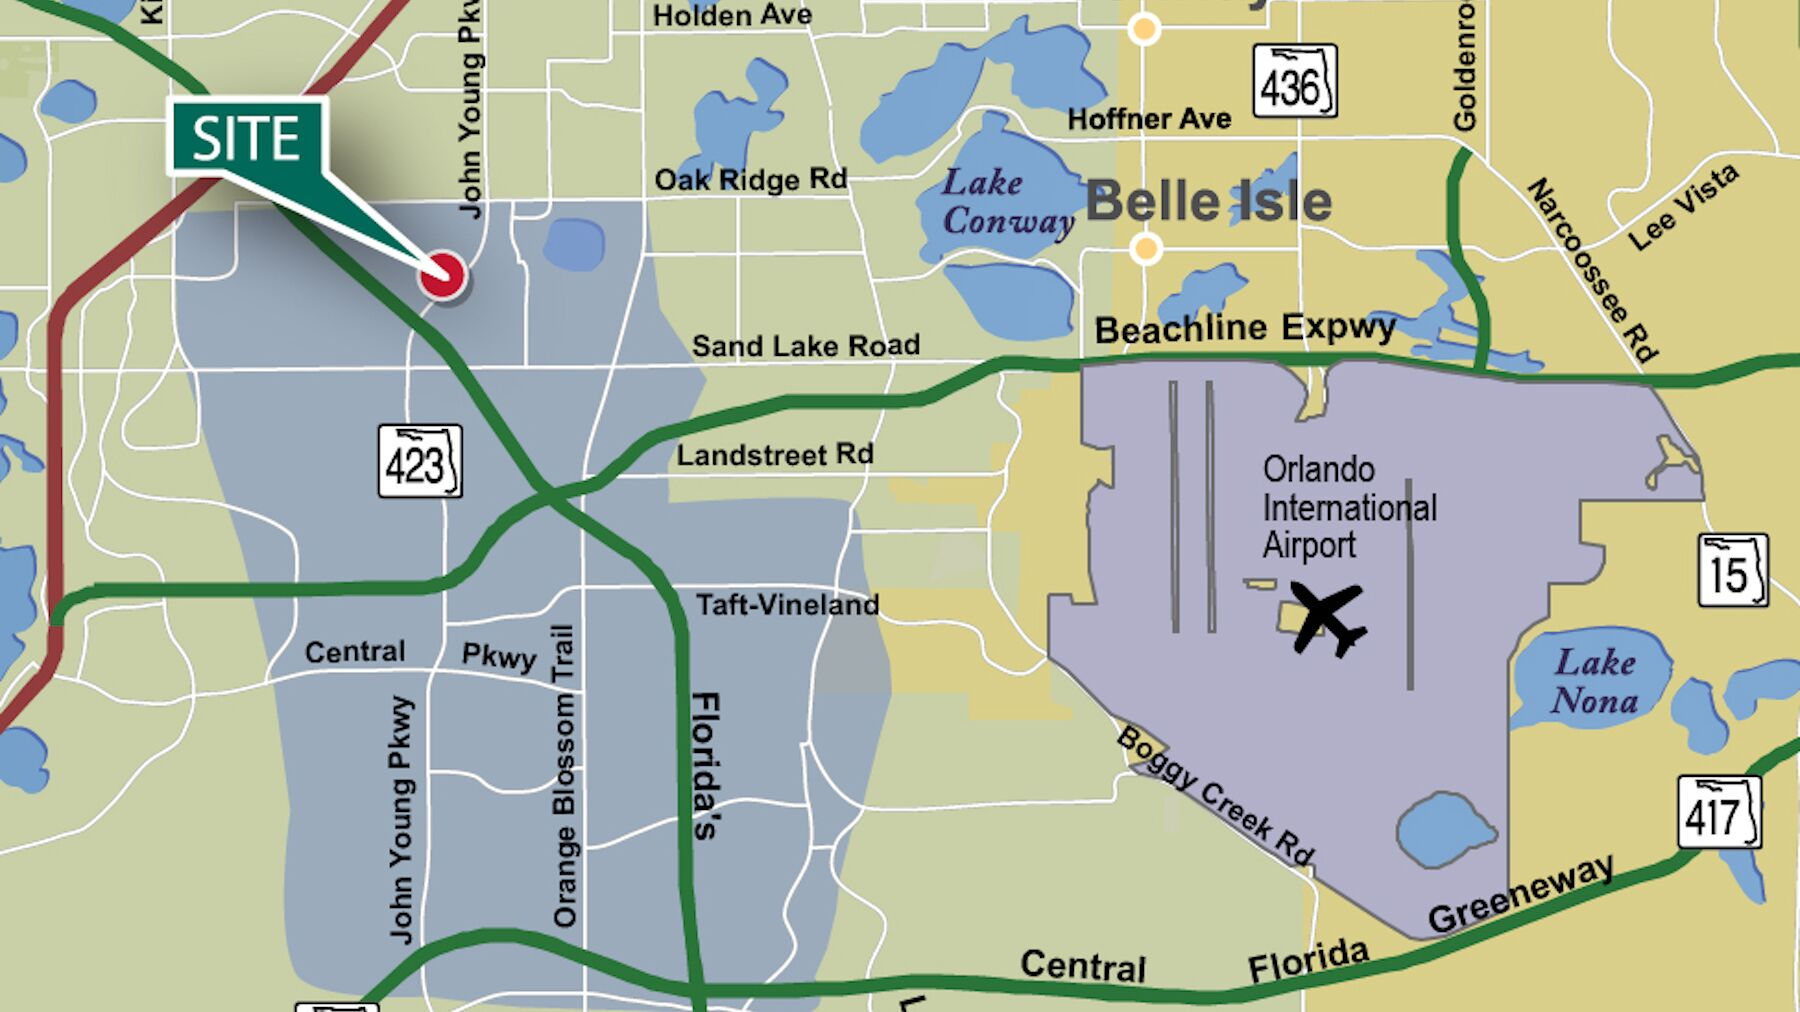 DPM-Prologis-Orlando-Central-Park_Presidents-Dr_Map.jpg